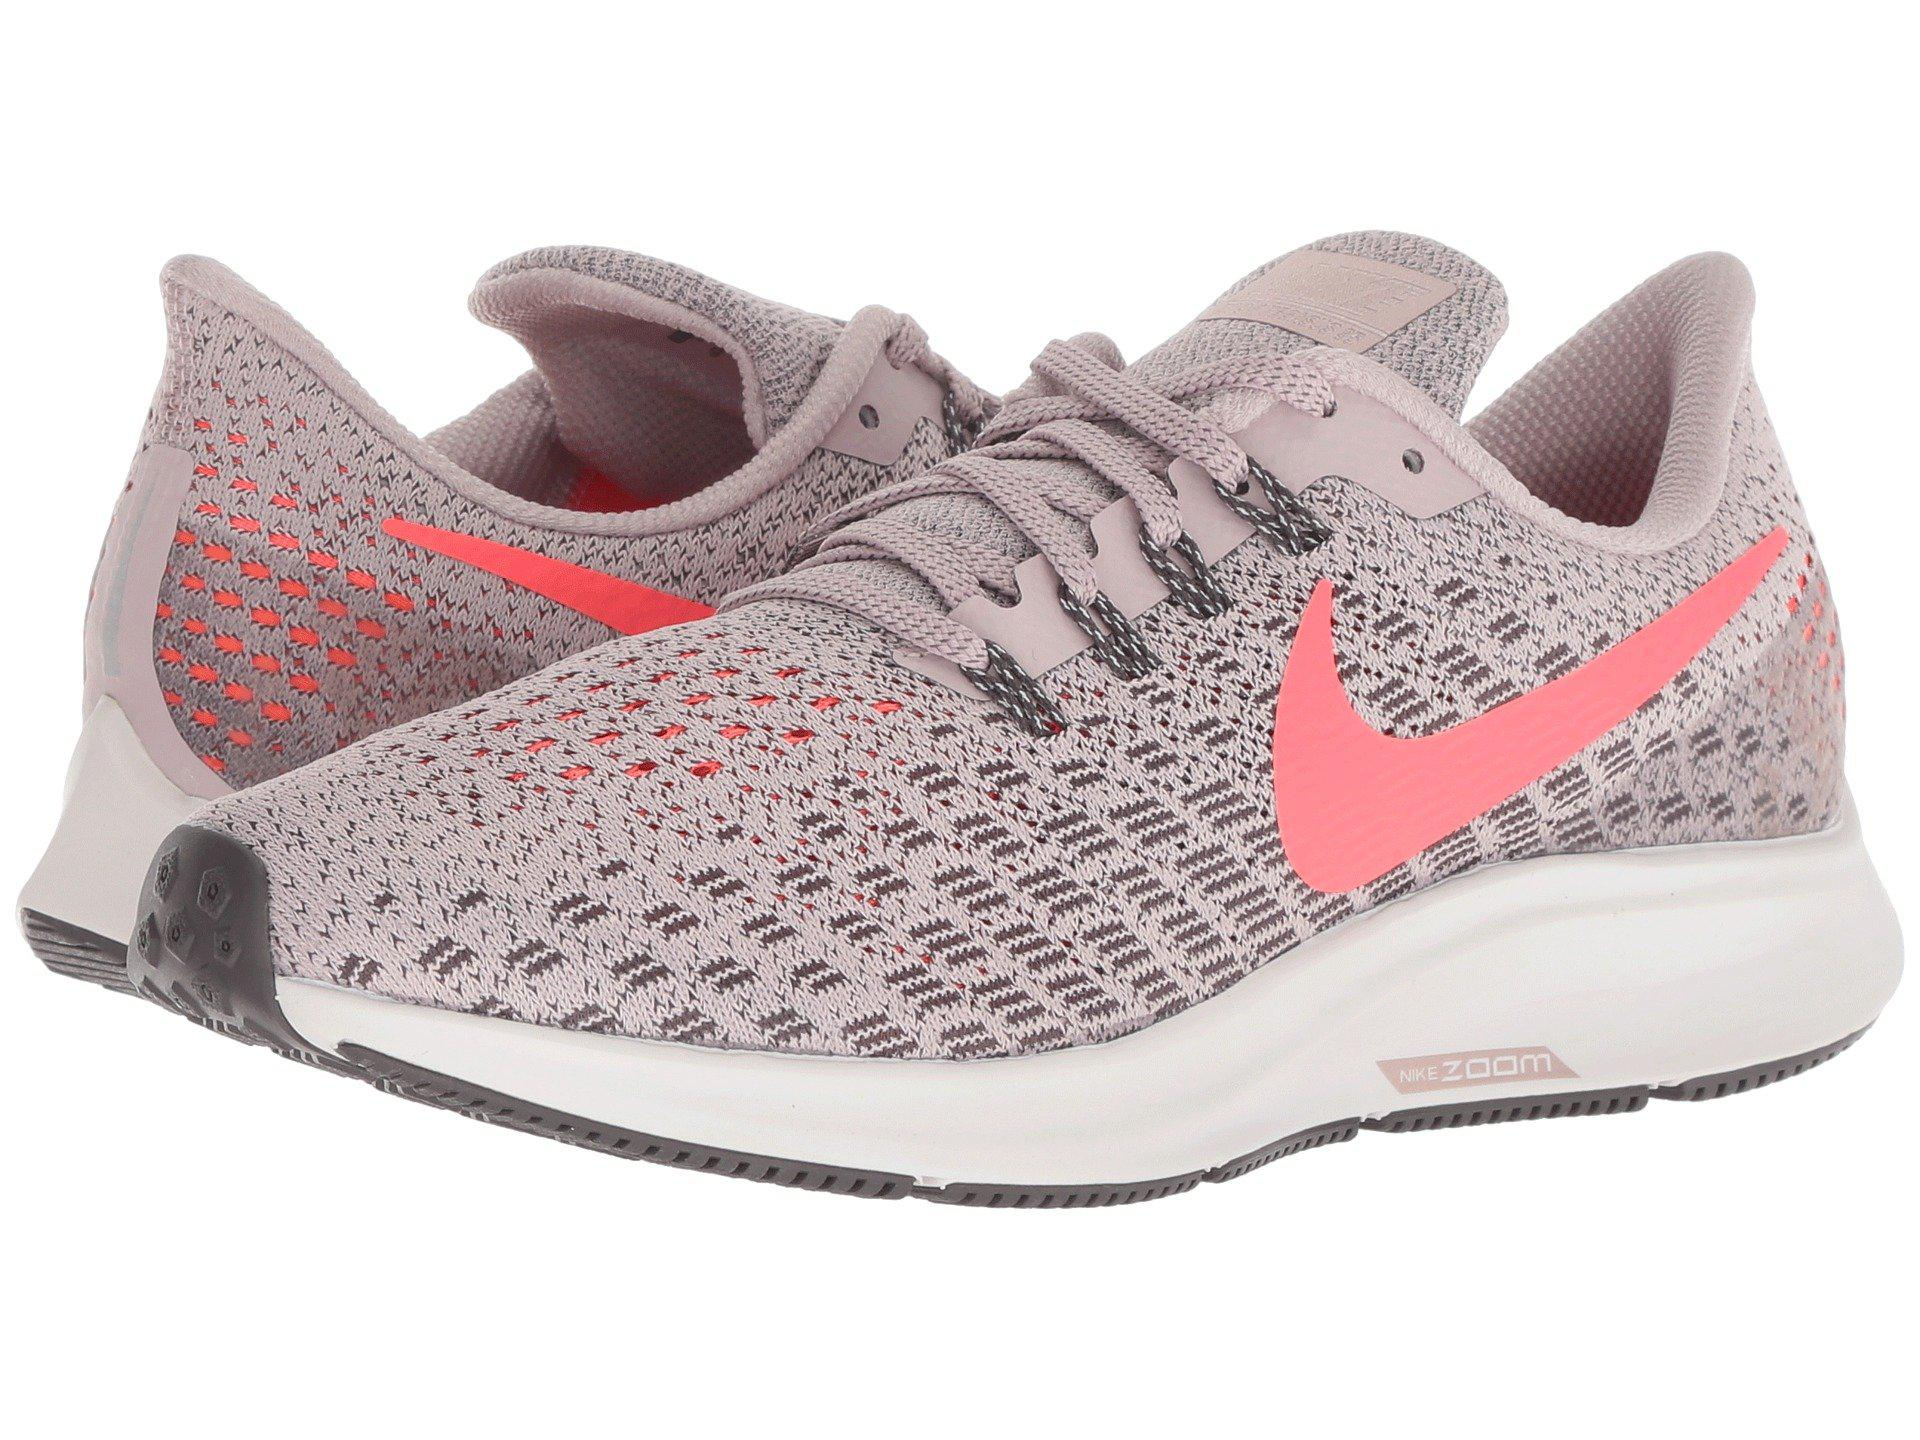 8142c39ff202 Lyst - Nike Air Zoom Pegasus 35 (black oil Grey white) Women s ...